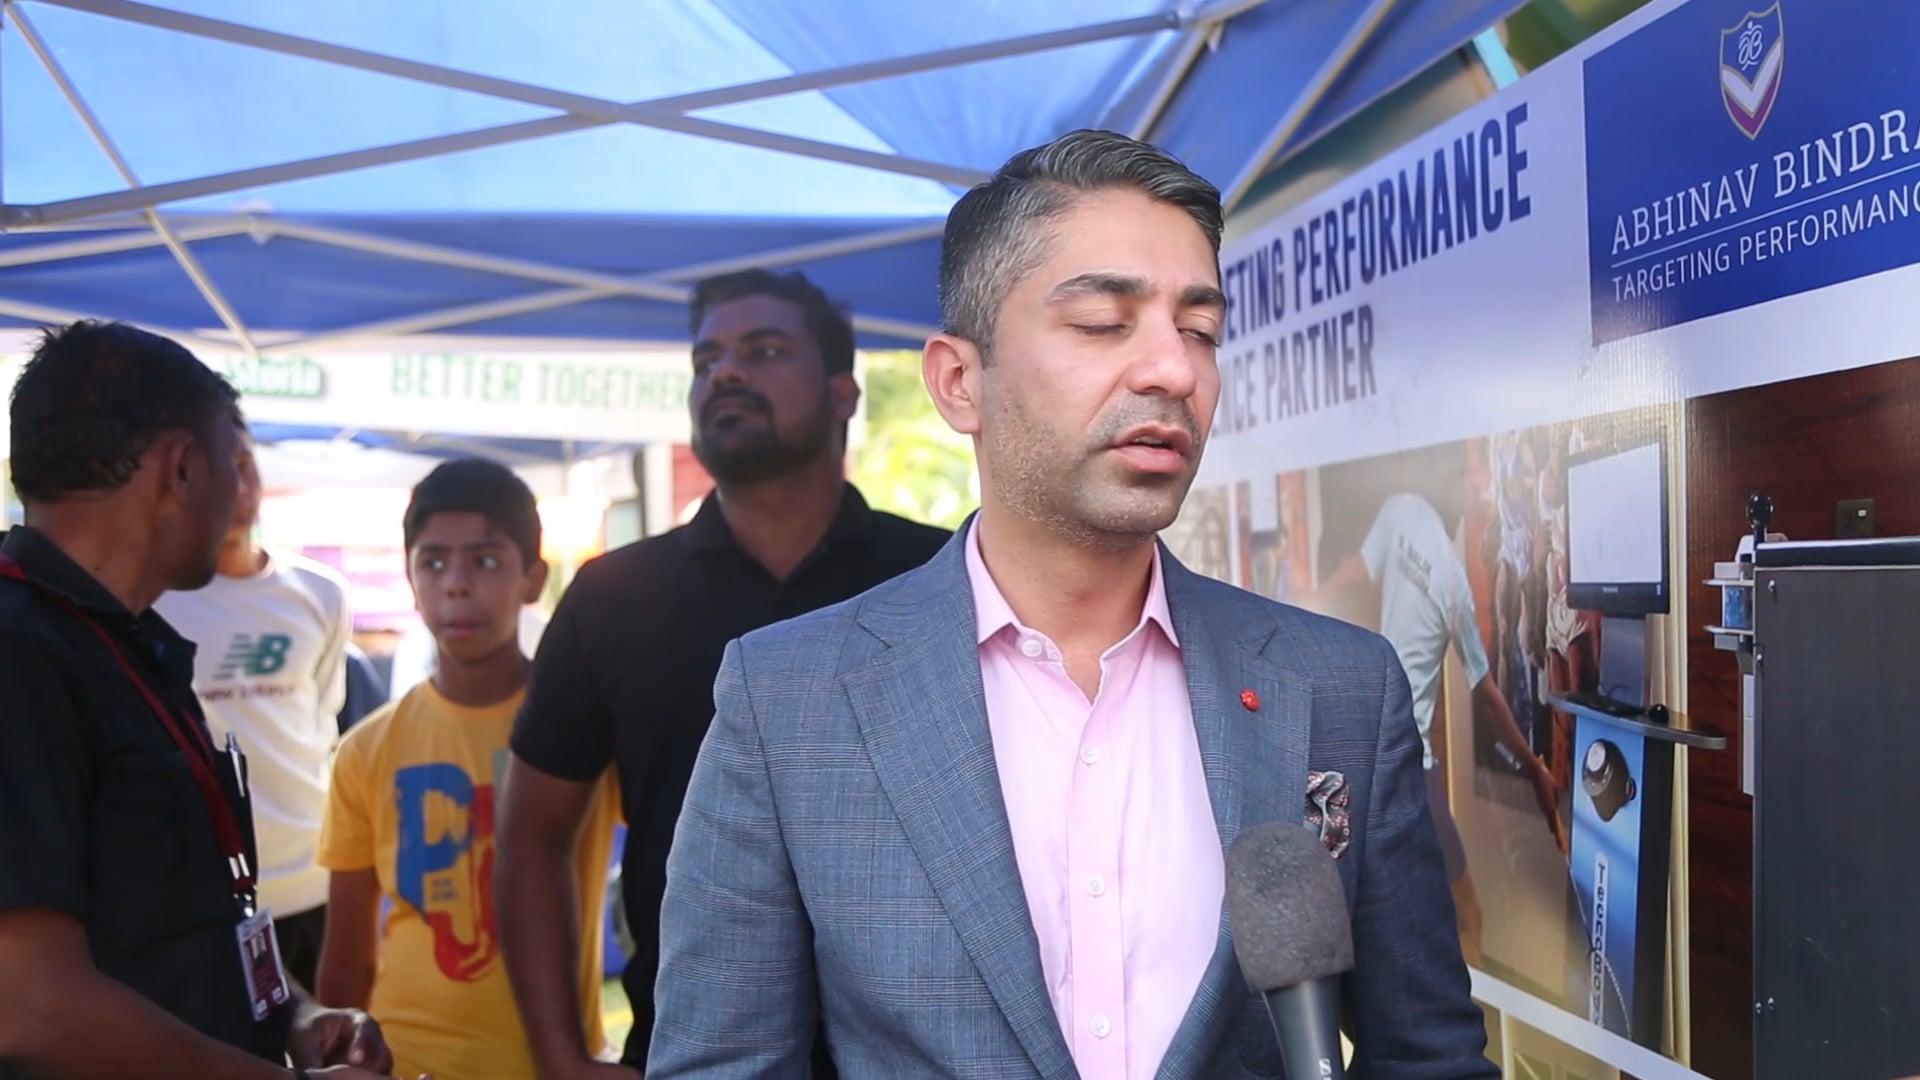 Abhinav Bindra at the SFA Championship Mumbai 2018